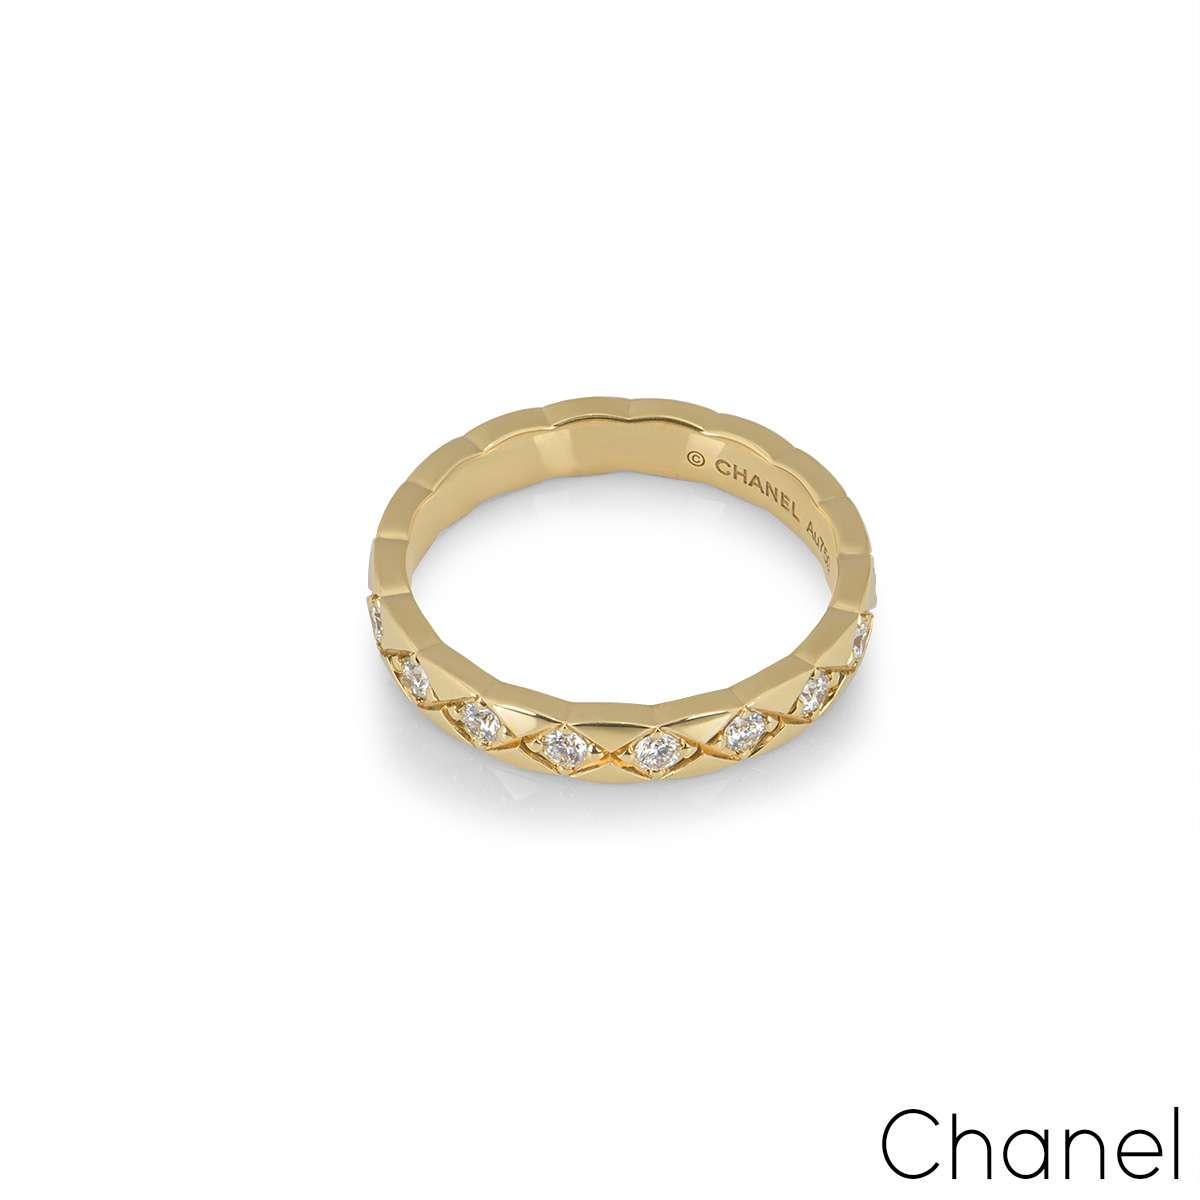 Chanel Yellow Gold Coco Crush Ring J11872